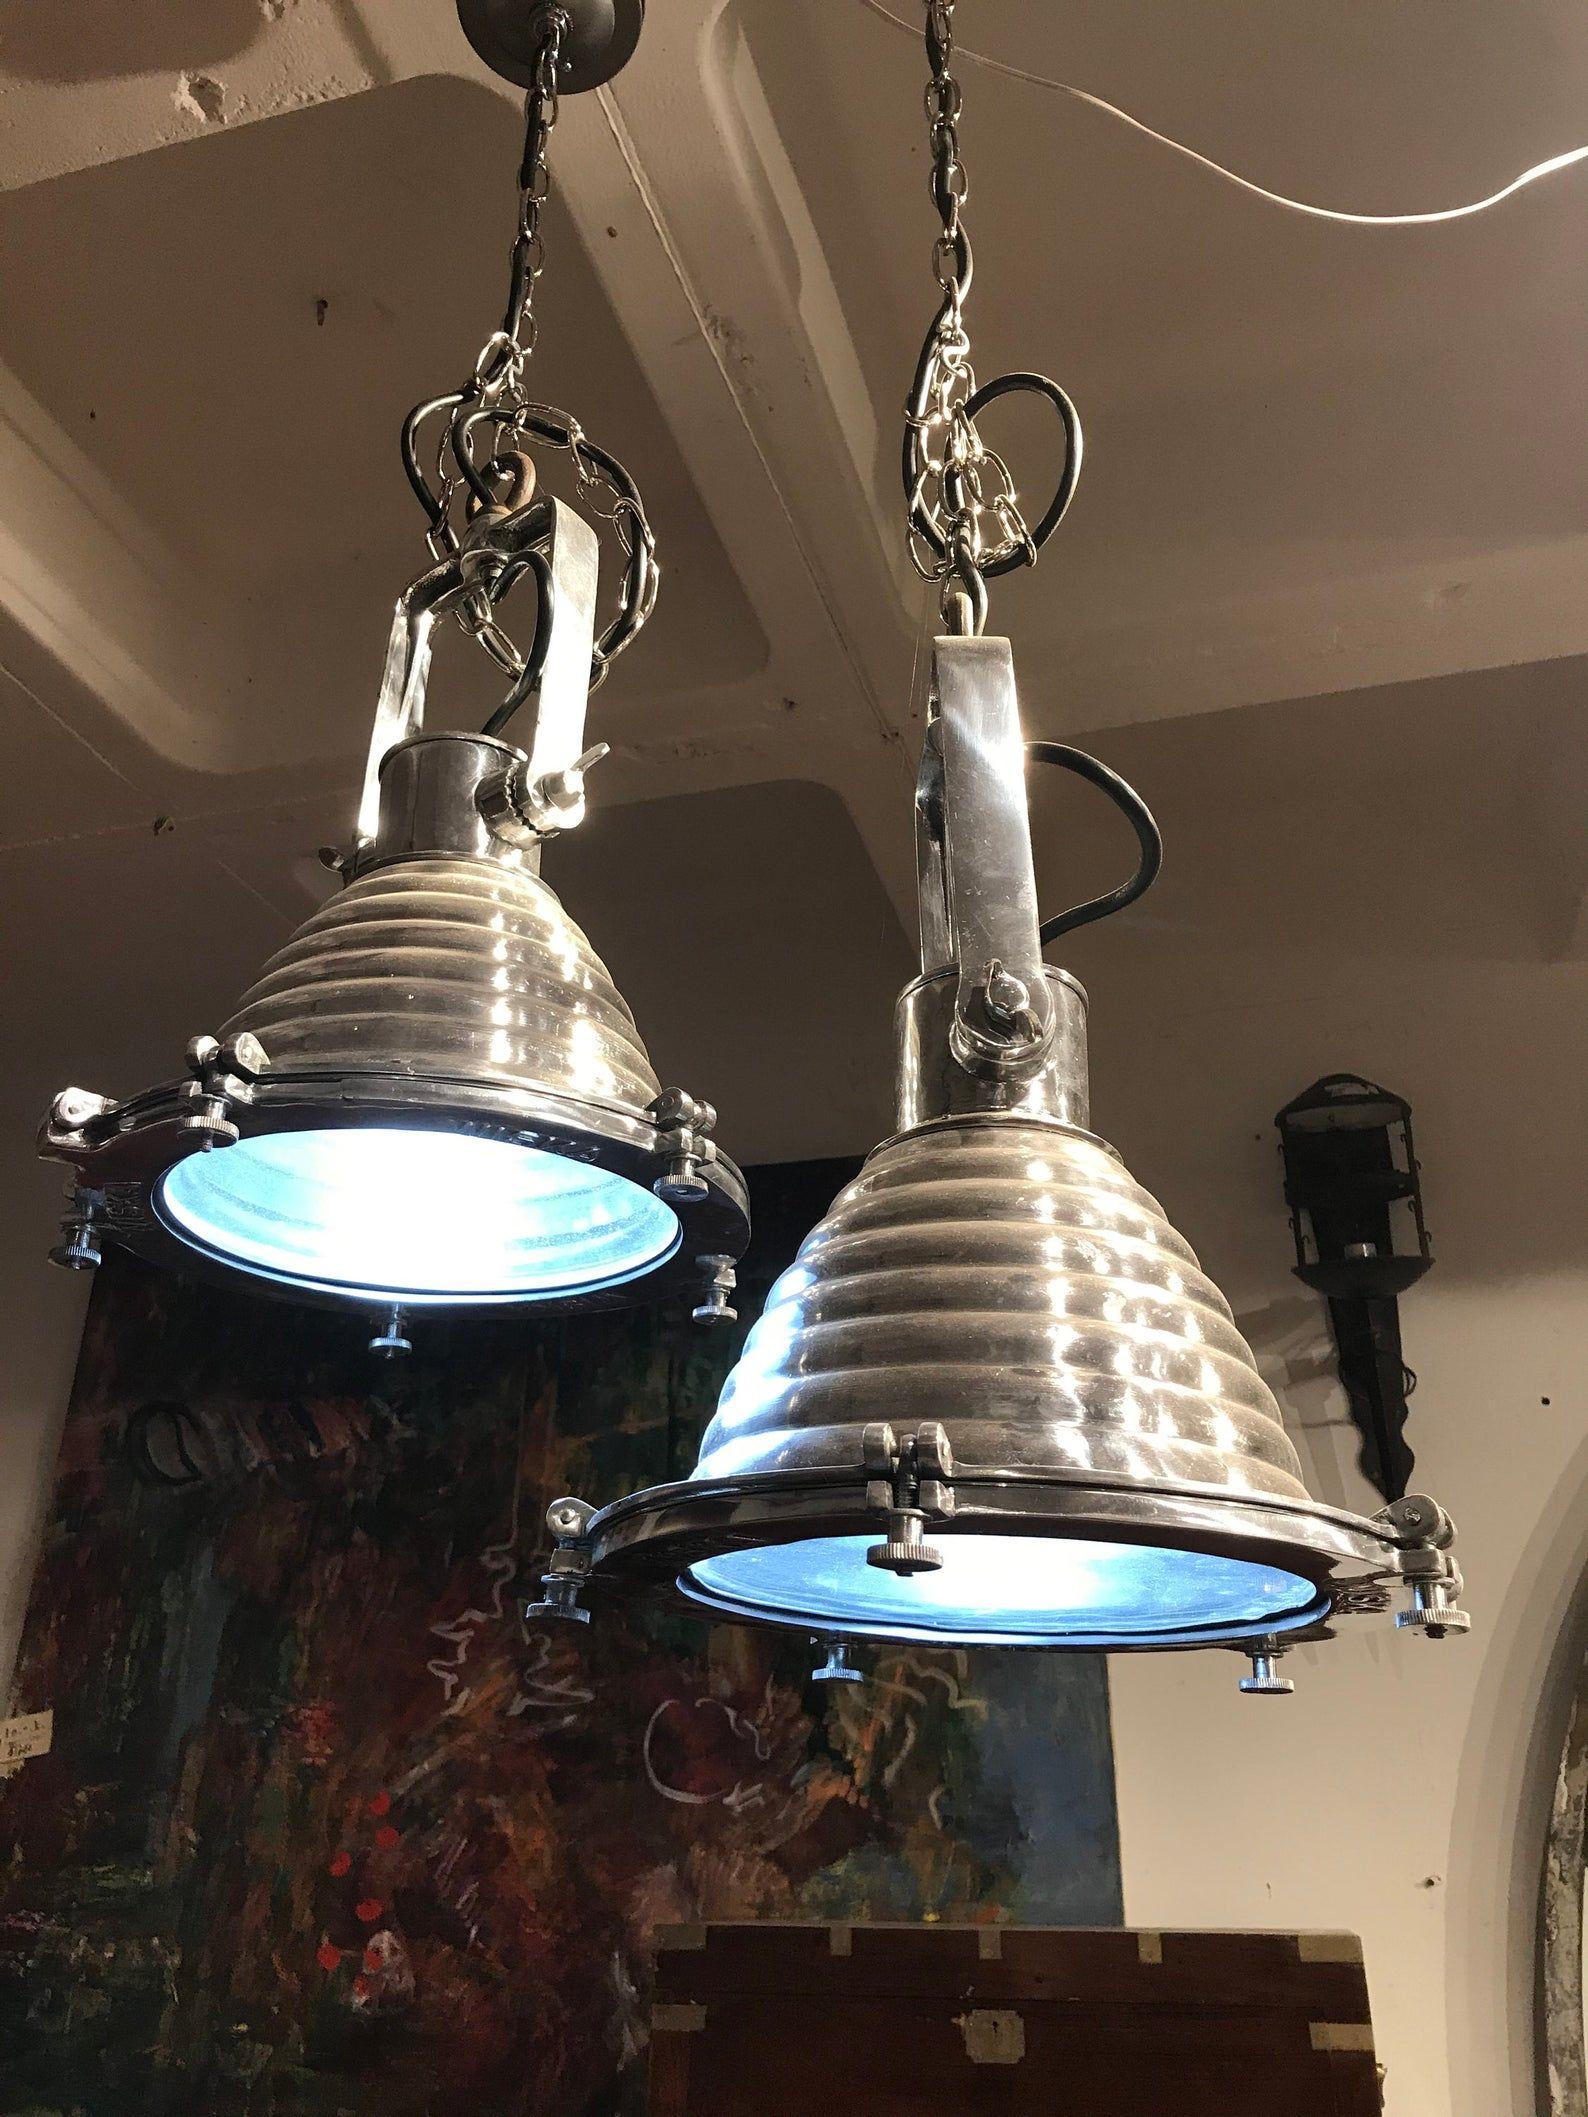 Nautical Industrial Pendant Light Industrial Pendant Lights Vintage Lighting Pendant Light